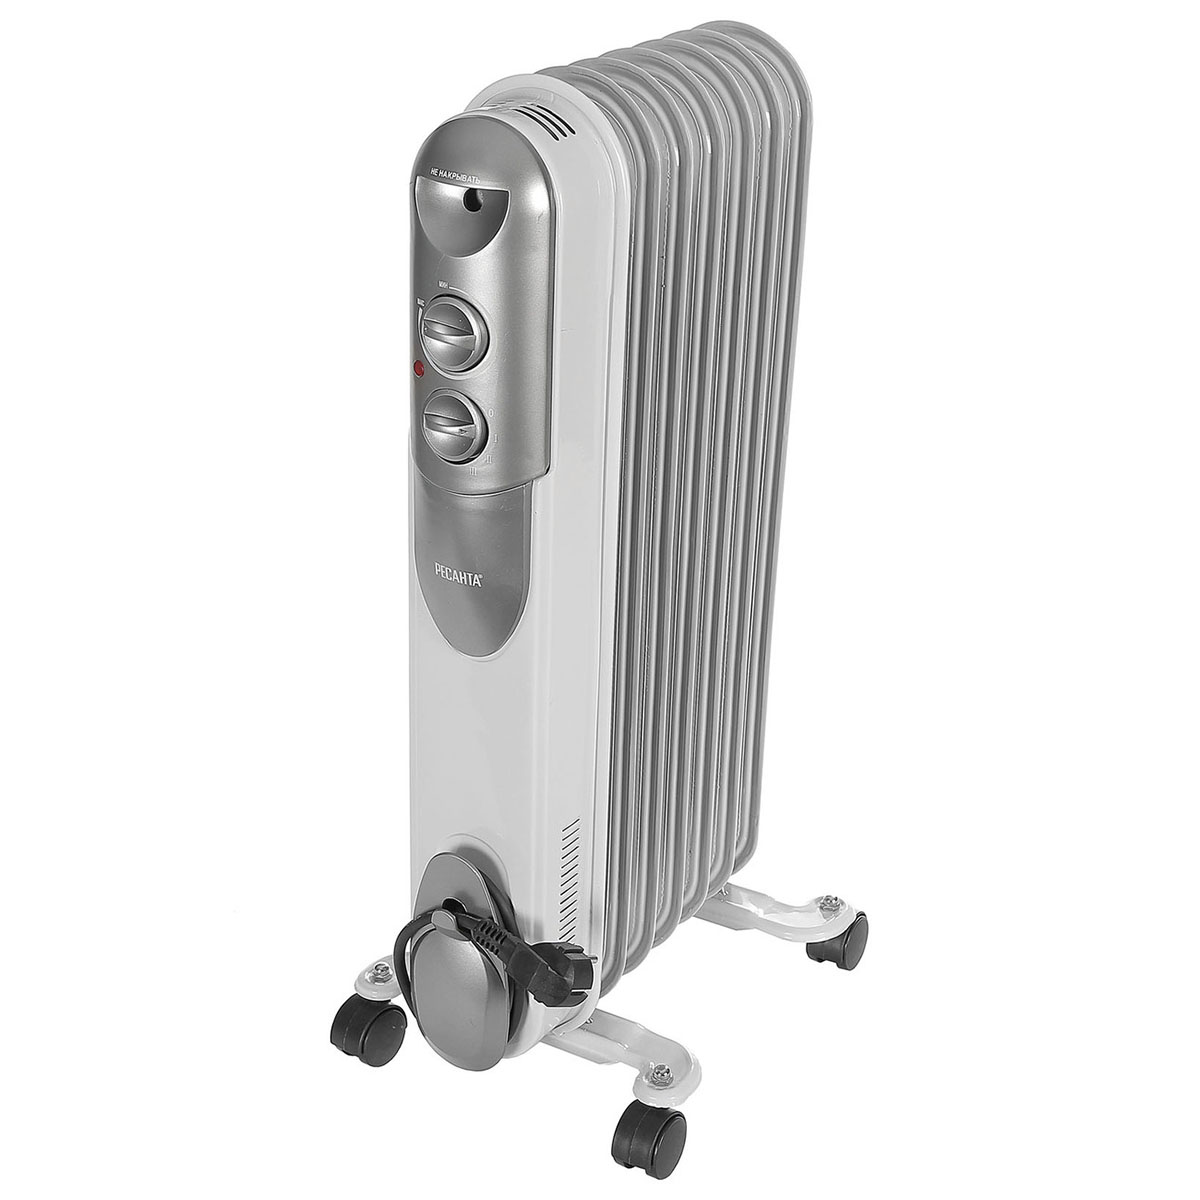 Heater Oil Resanta ОМПТ-7Н (Power 1500 W, 7 sections, adjustment heating) heater oil resanta омпт 7н power 1500 w 7 sections adjustment heating